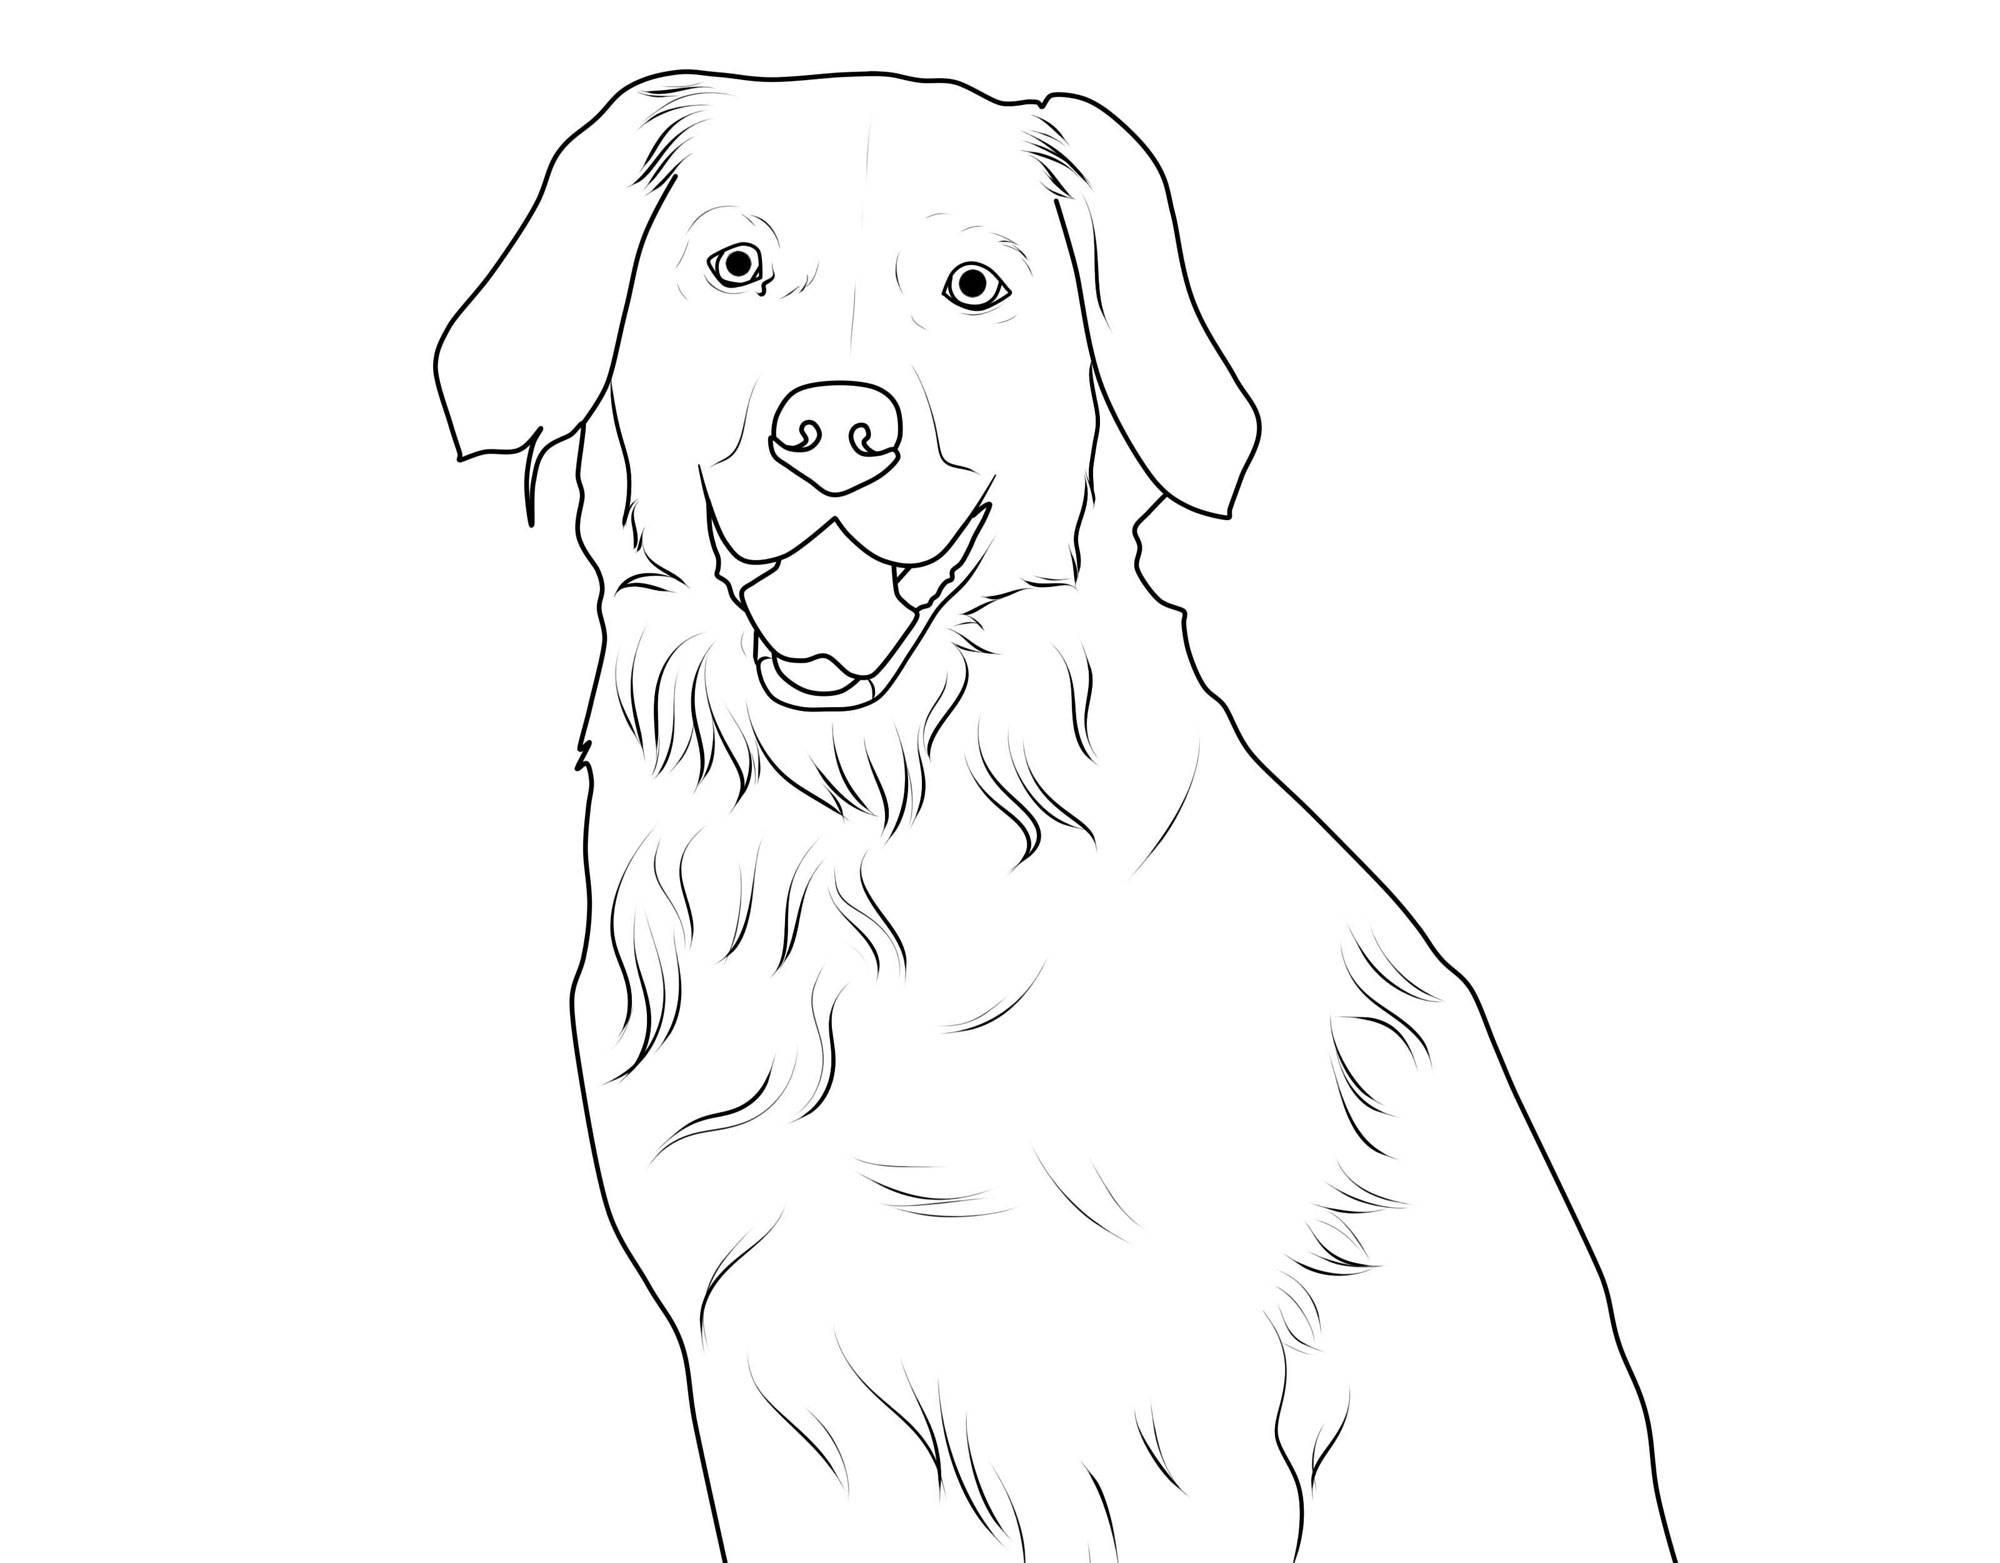 Ausmalbild Hunde Labrador Kostenlos Ausdrucken